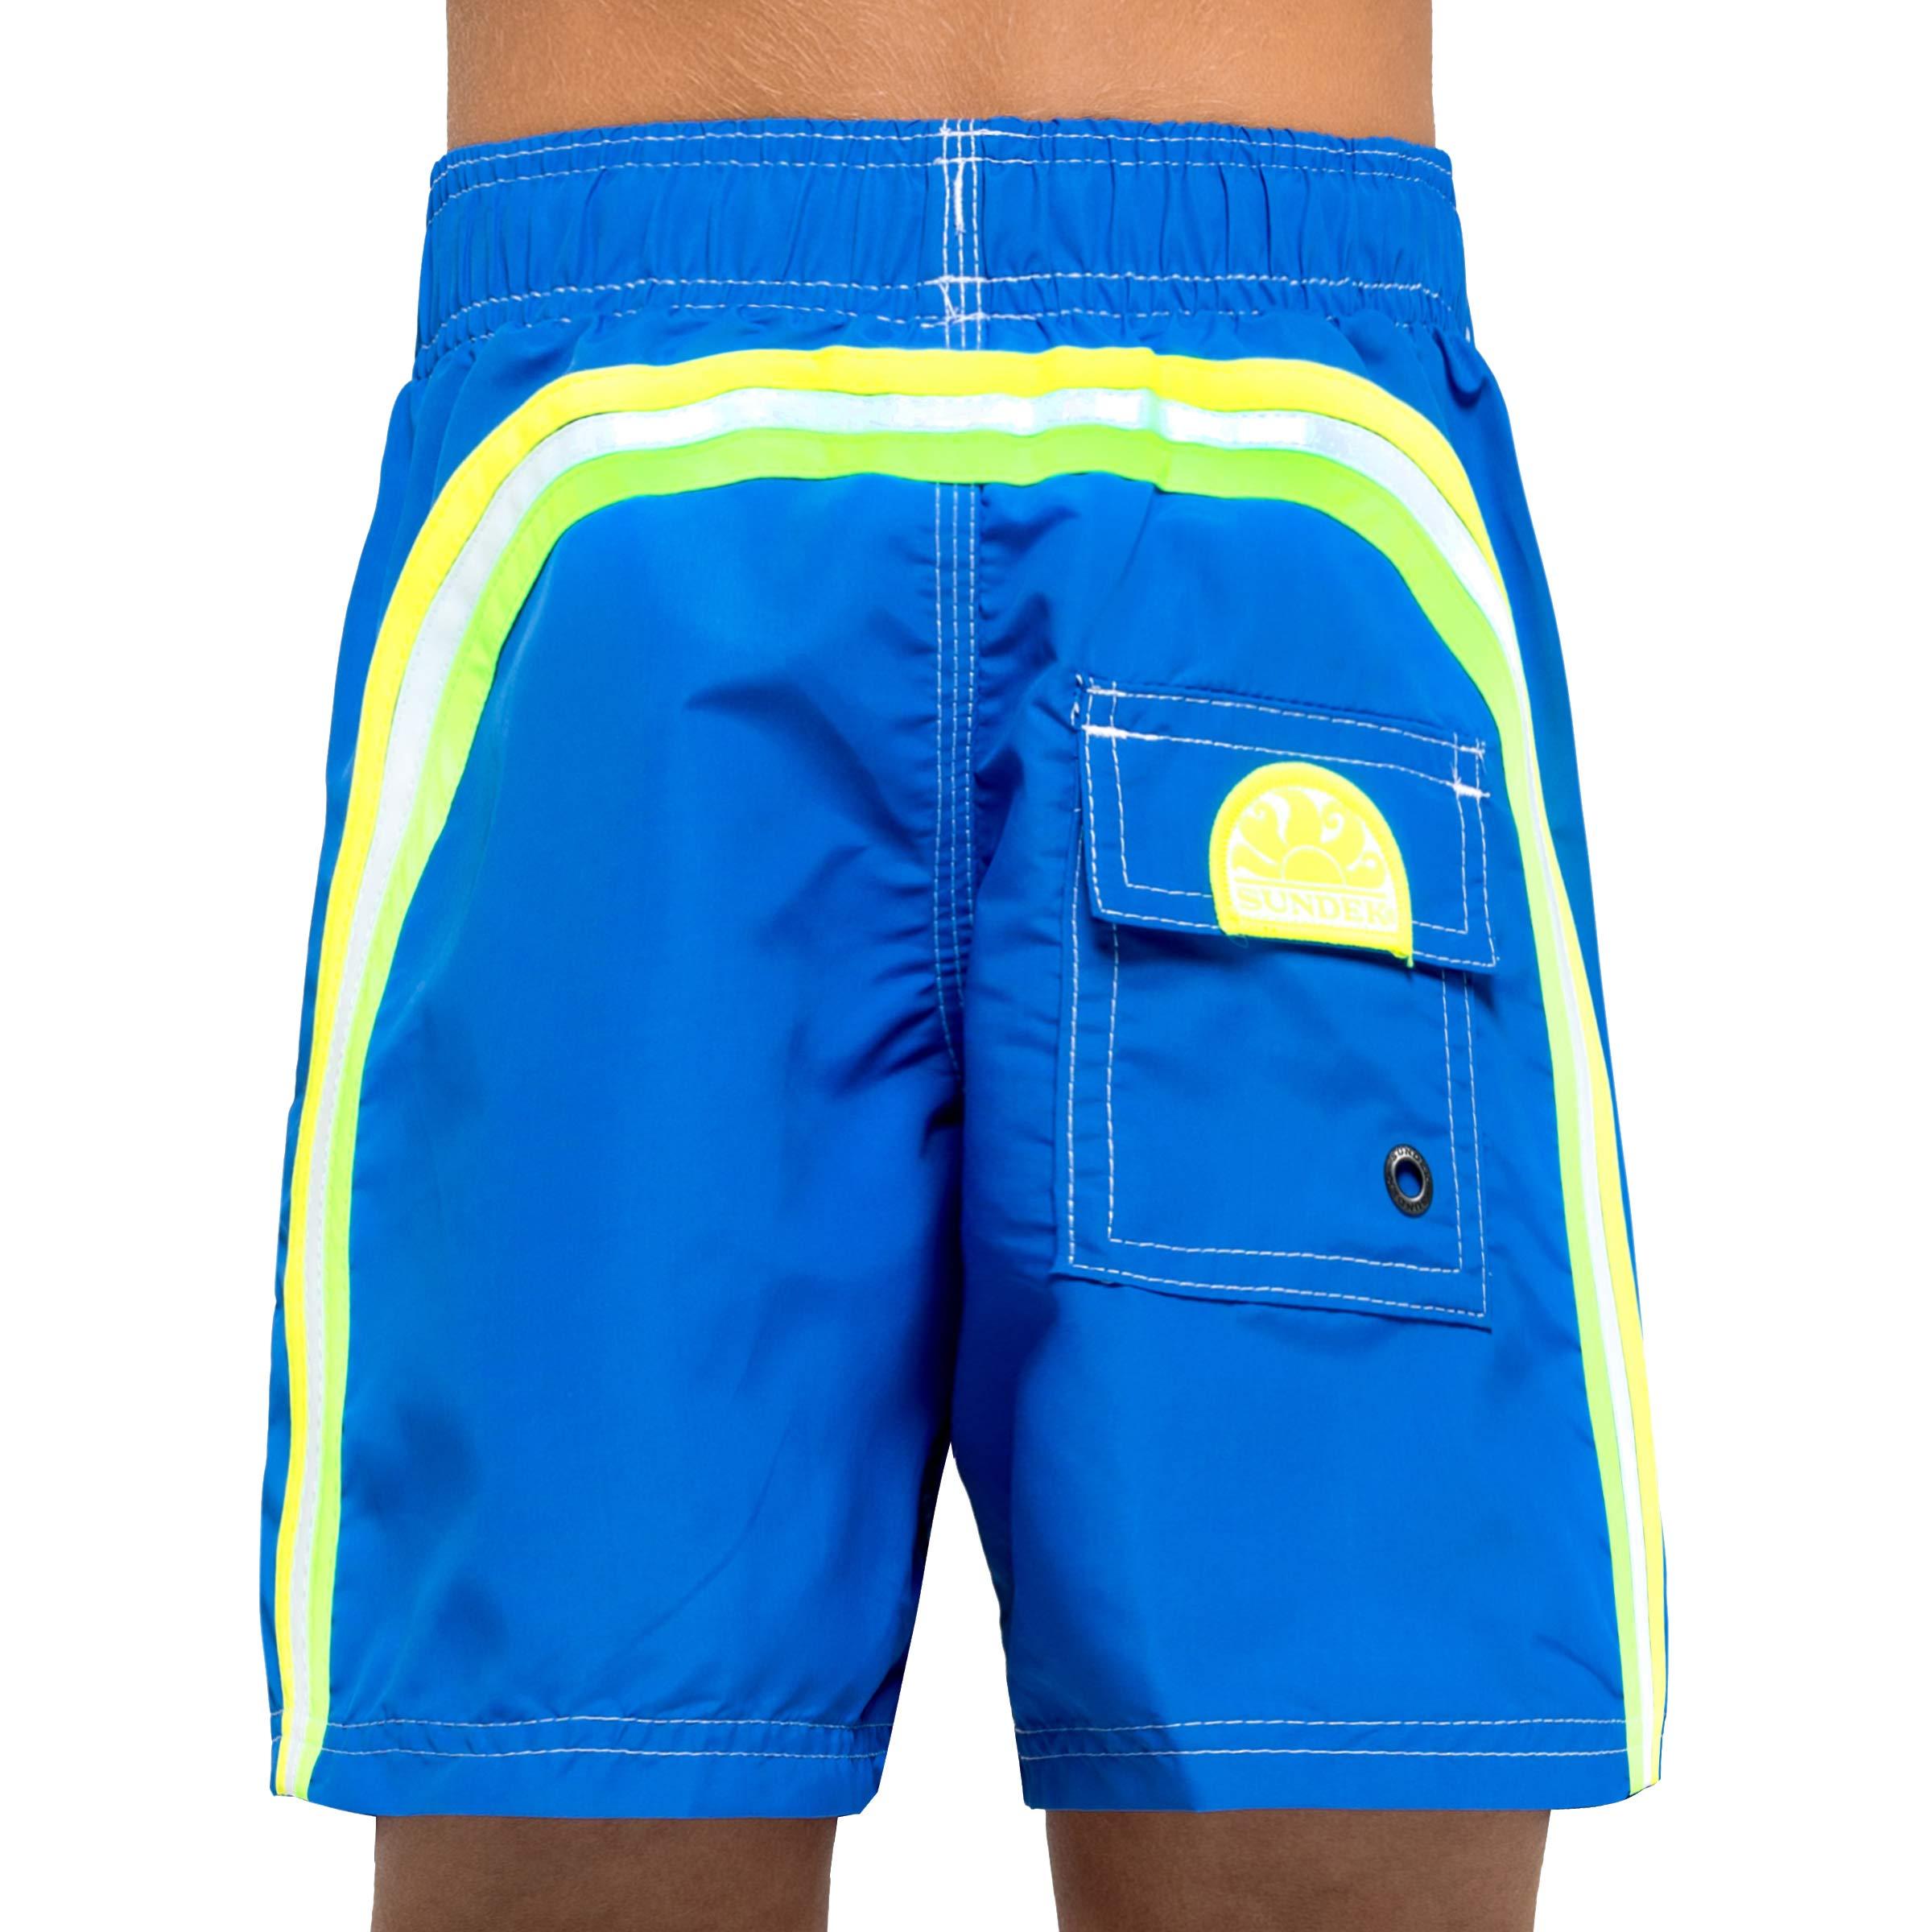 Sundek Classic Boy's Shorts - 10'' Long - with Rainbow ON The Back (SAPPHIRE #8, 4)